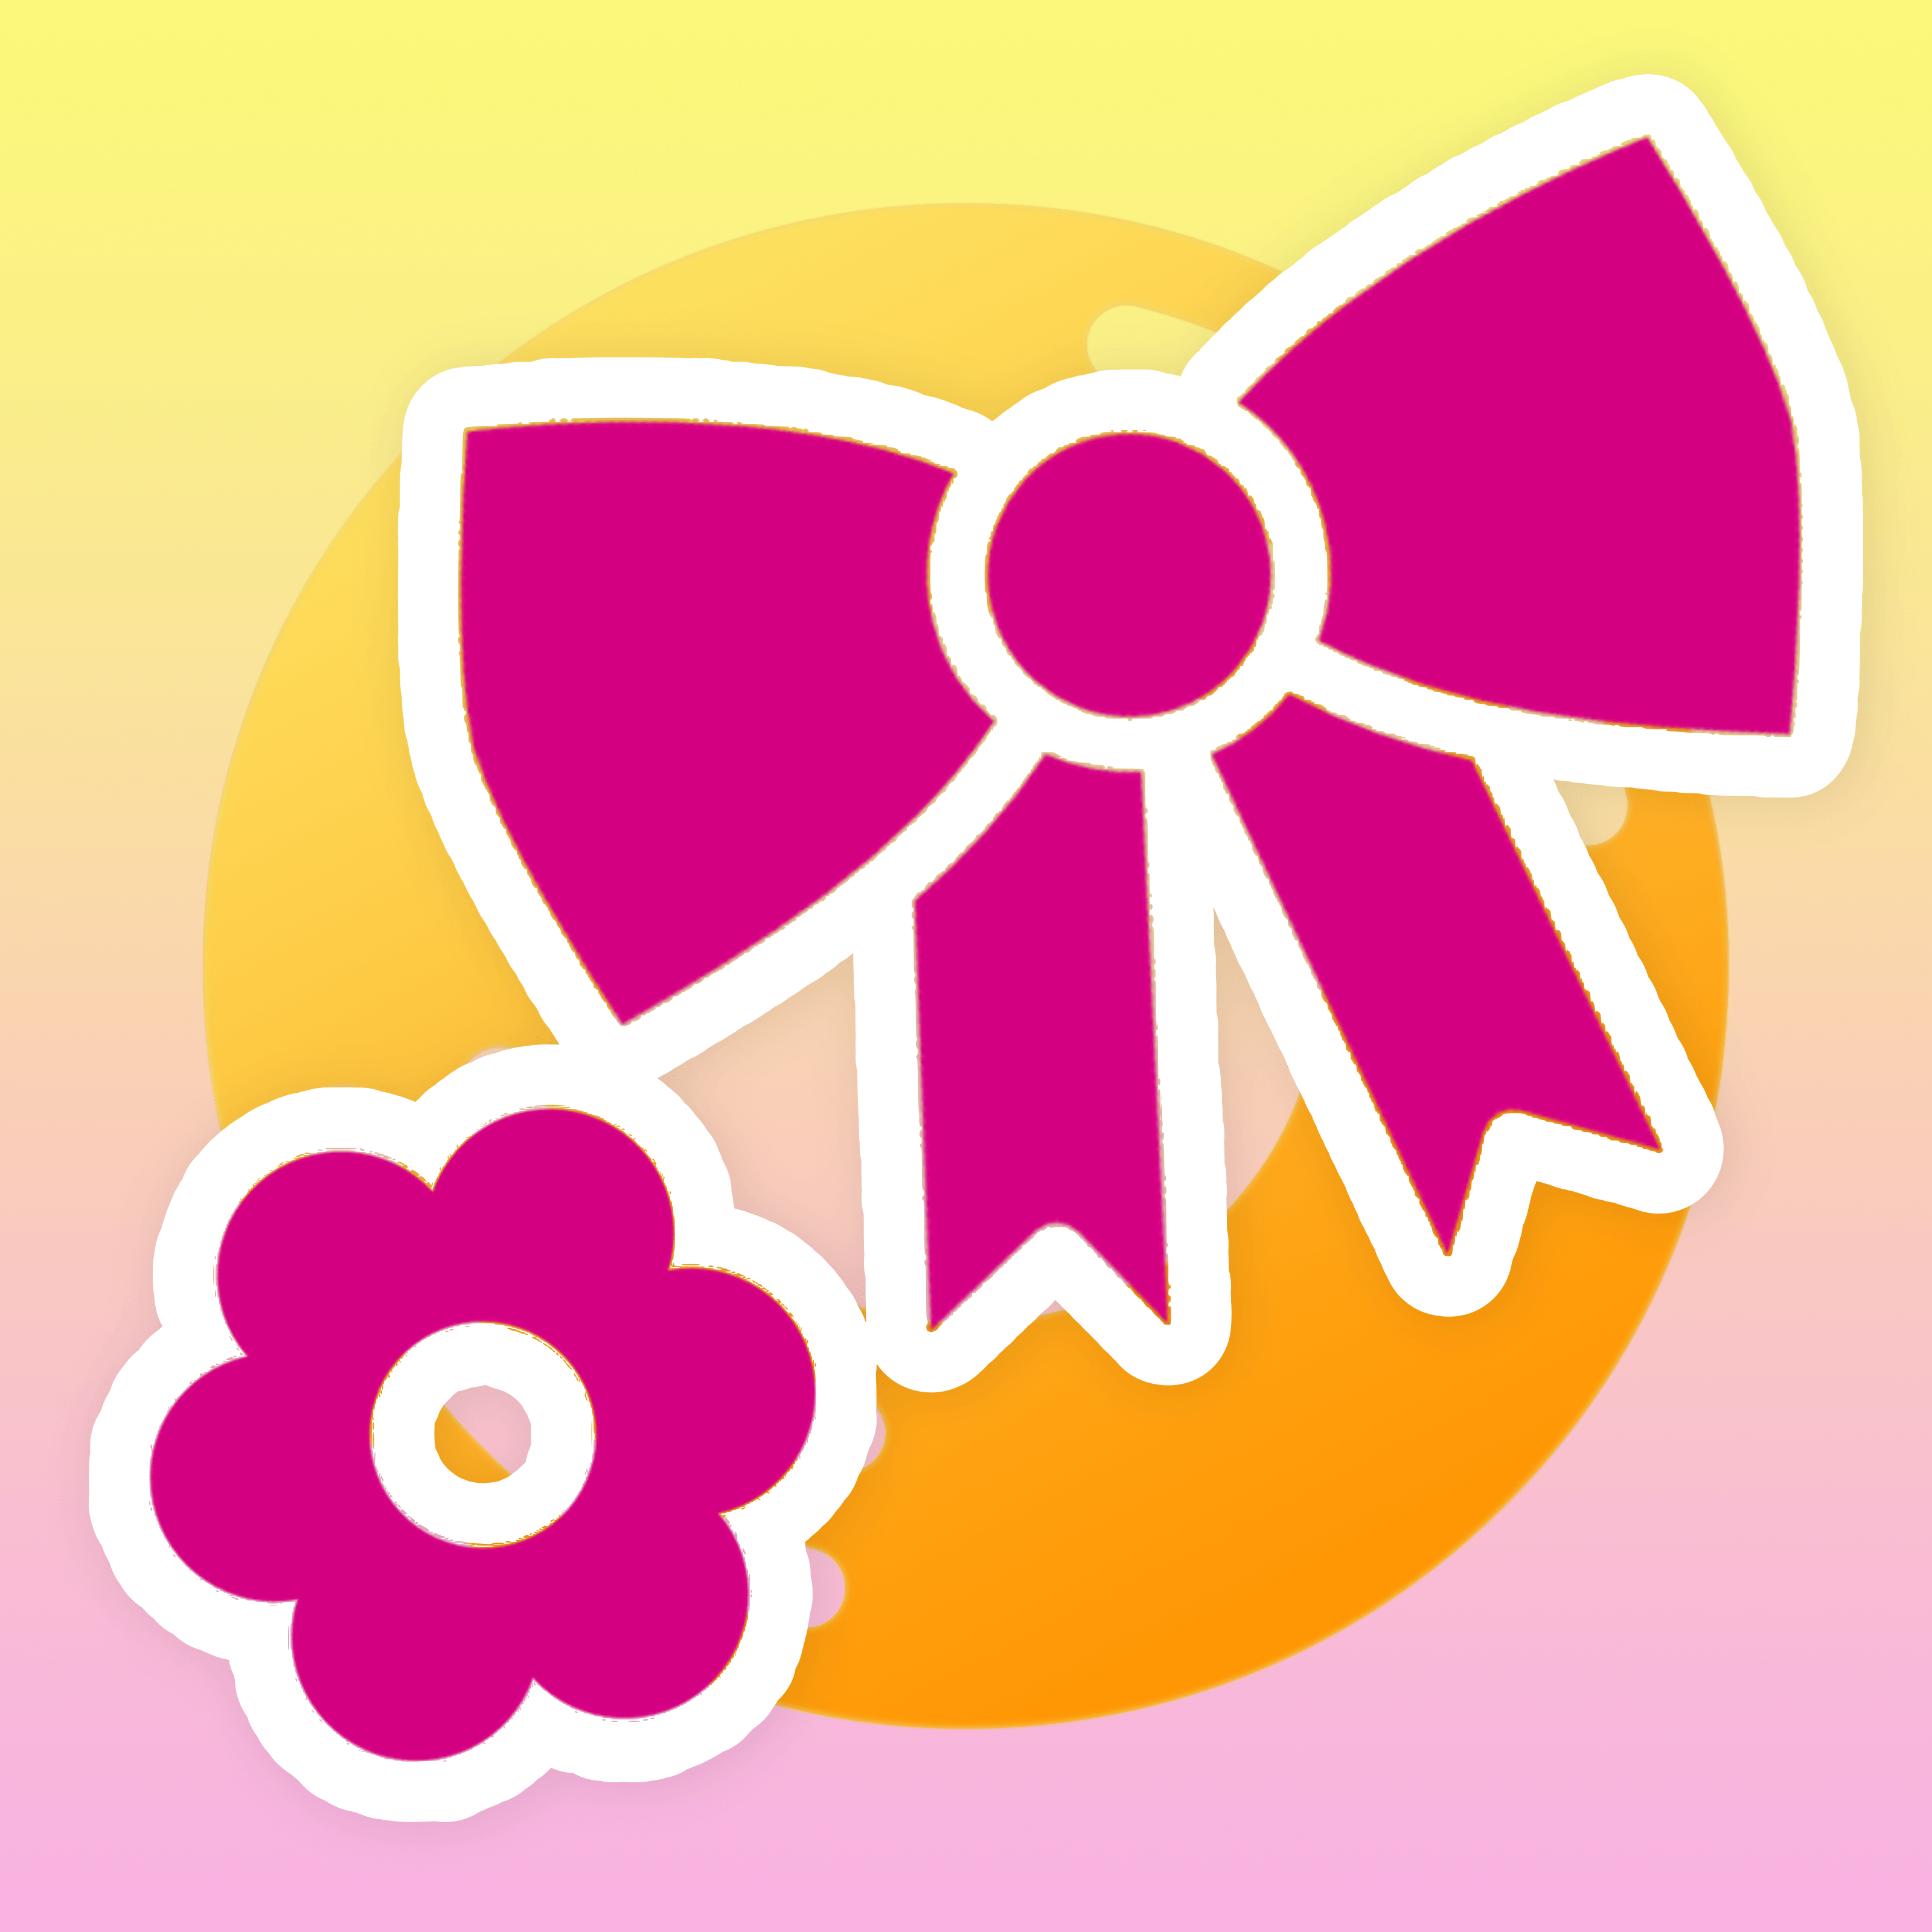 Octo avatar